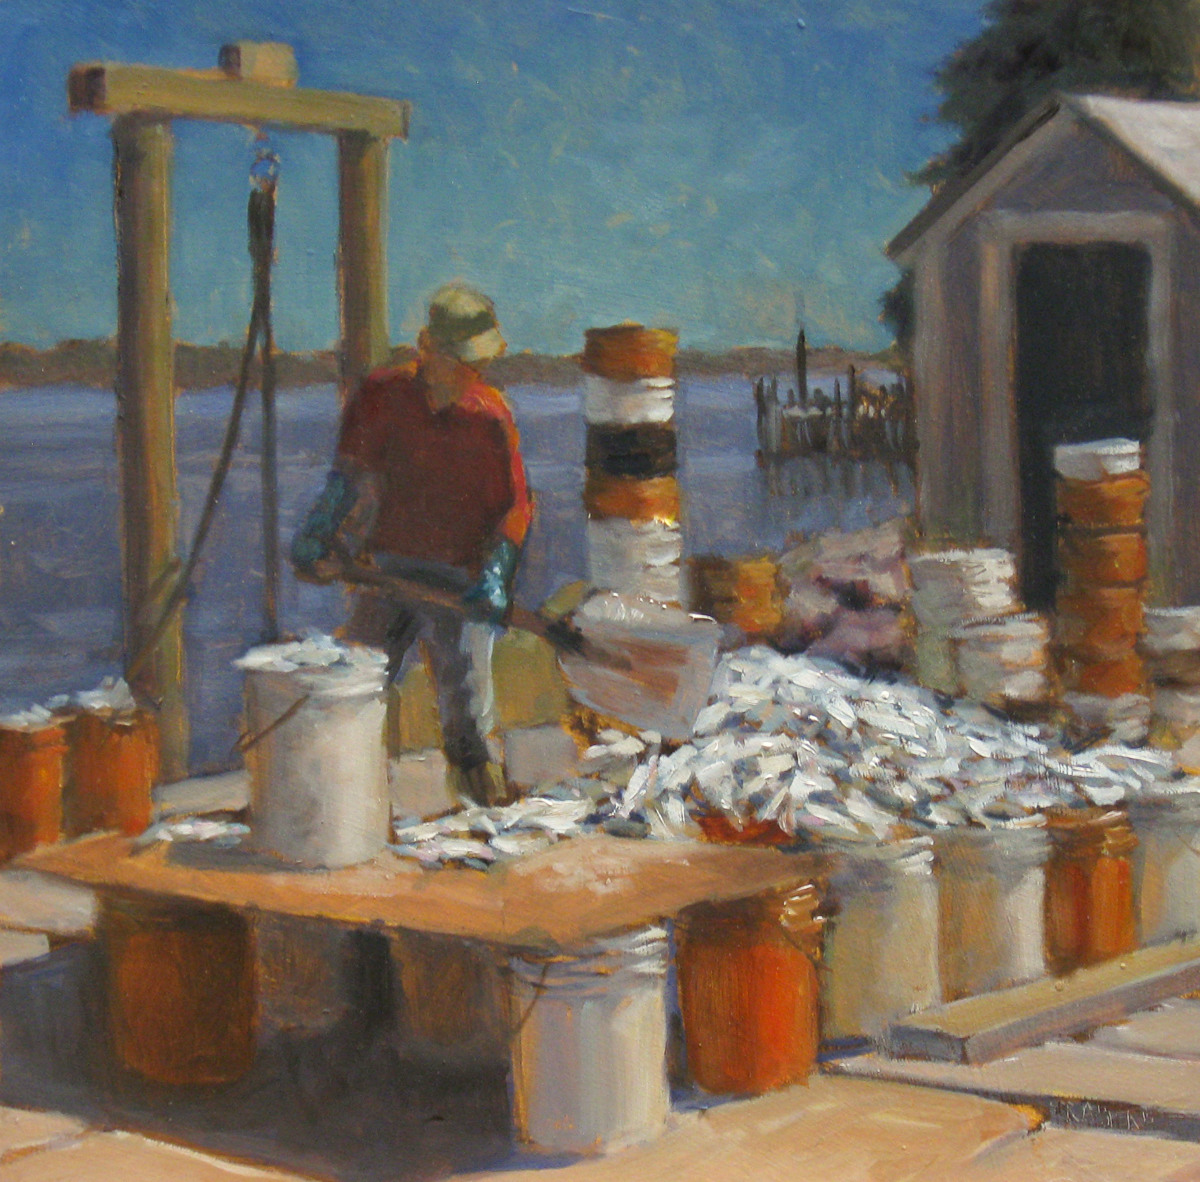 Wharfwork (large view)